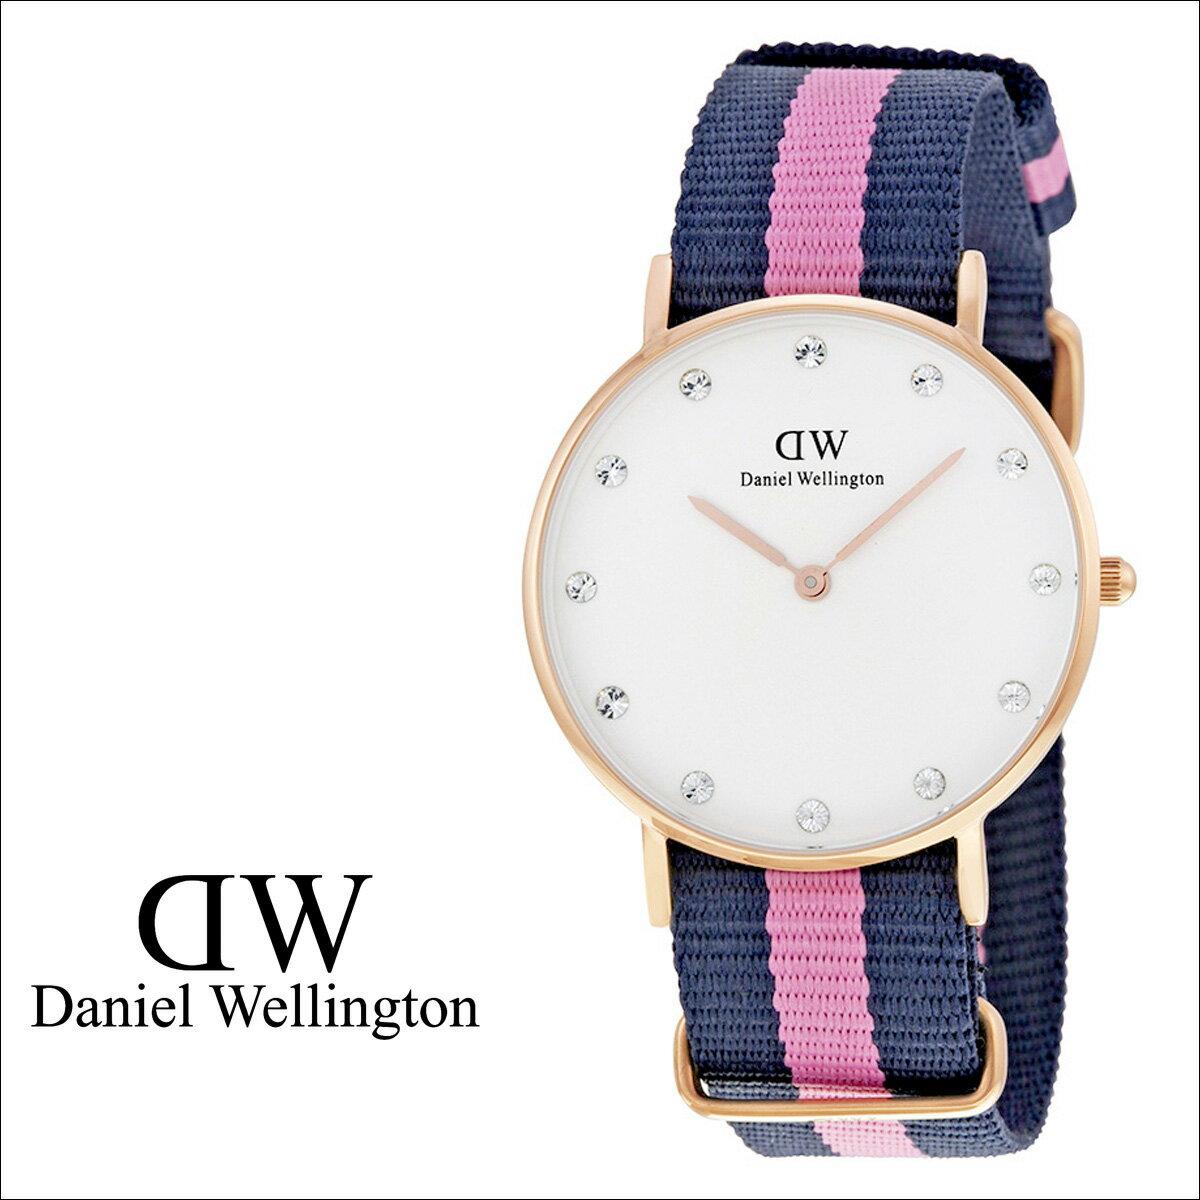 Daniel Wellington ダニエルウェリントン 34mm 腕時計 レディース  0952DW CLASSY WINCHESTER  ローズゴールド  送料無料  ダニエル ウェリントン Daniel Wellington 腕時計 34ミリ 正規  通販価格の適正さ